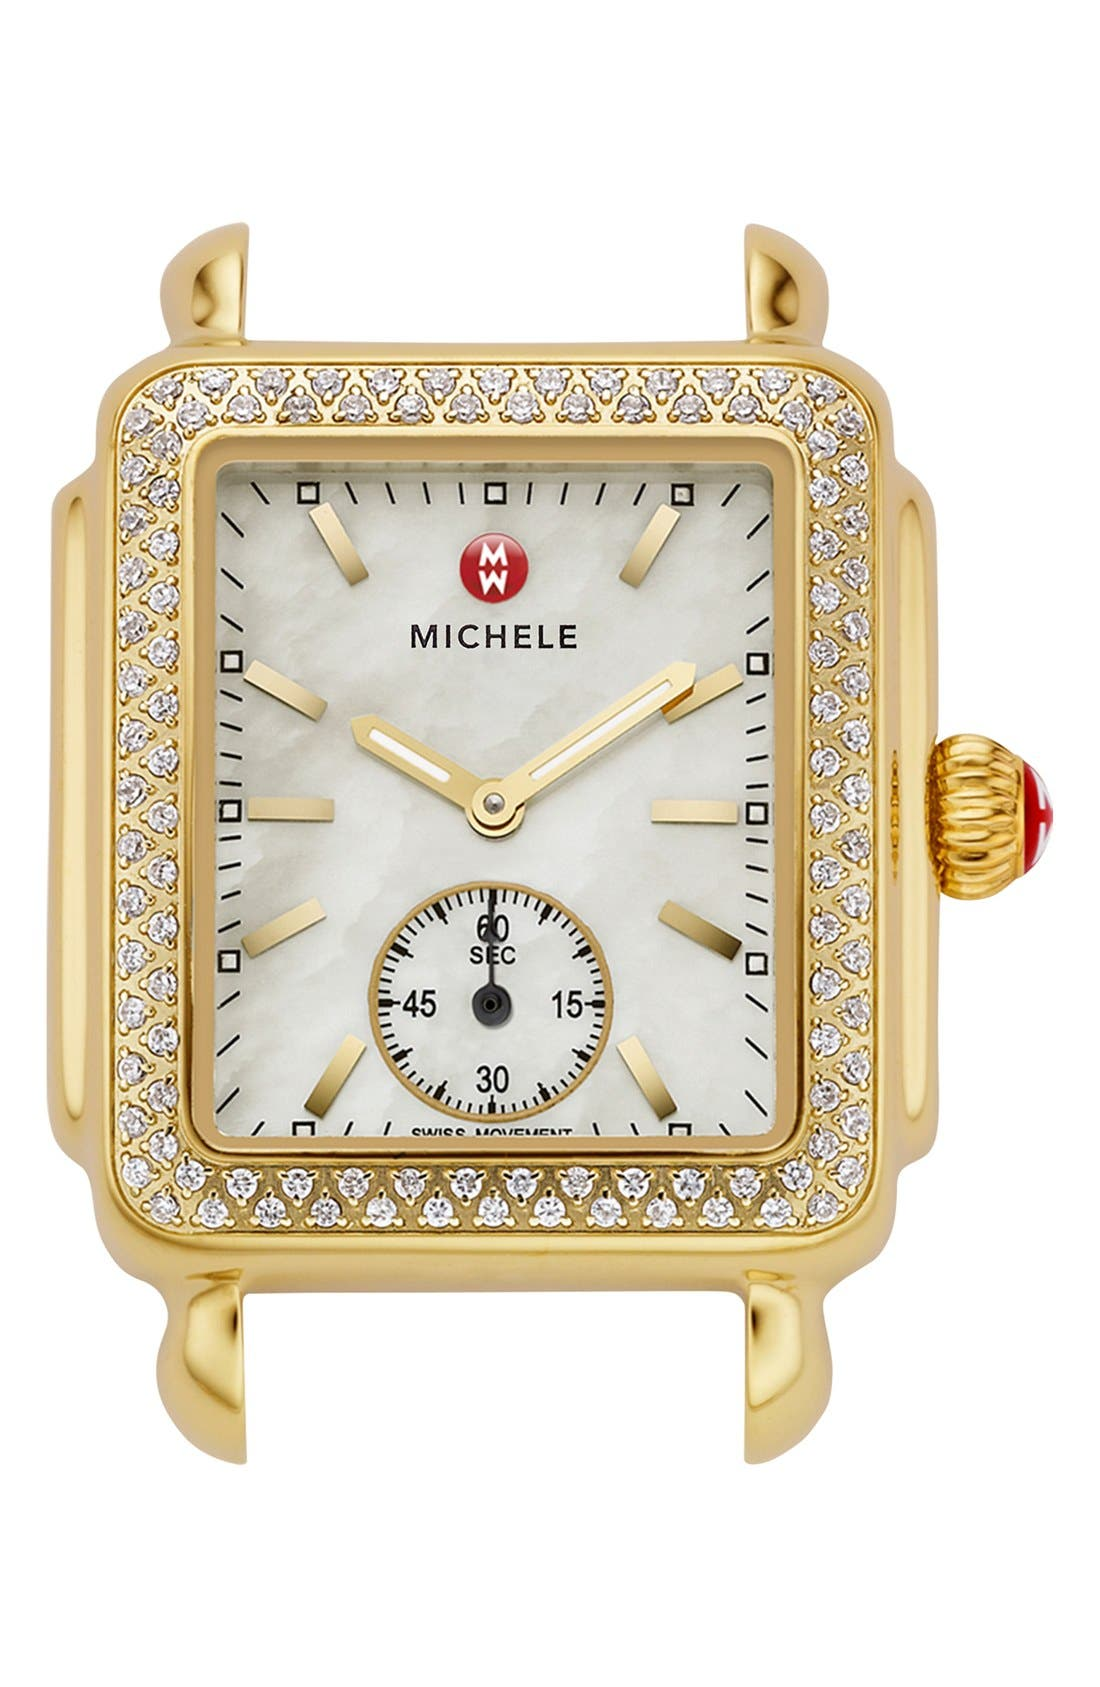 Main Image - MICHELE Deco 16 Diamond Gold Plated Watch Head, 29mm x 31mm